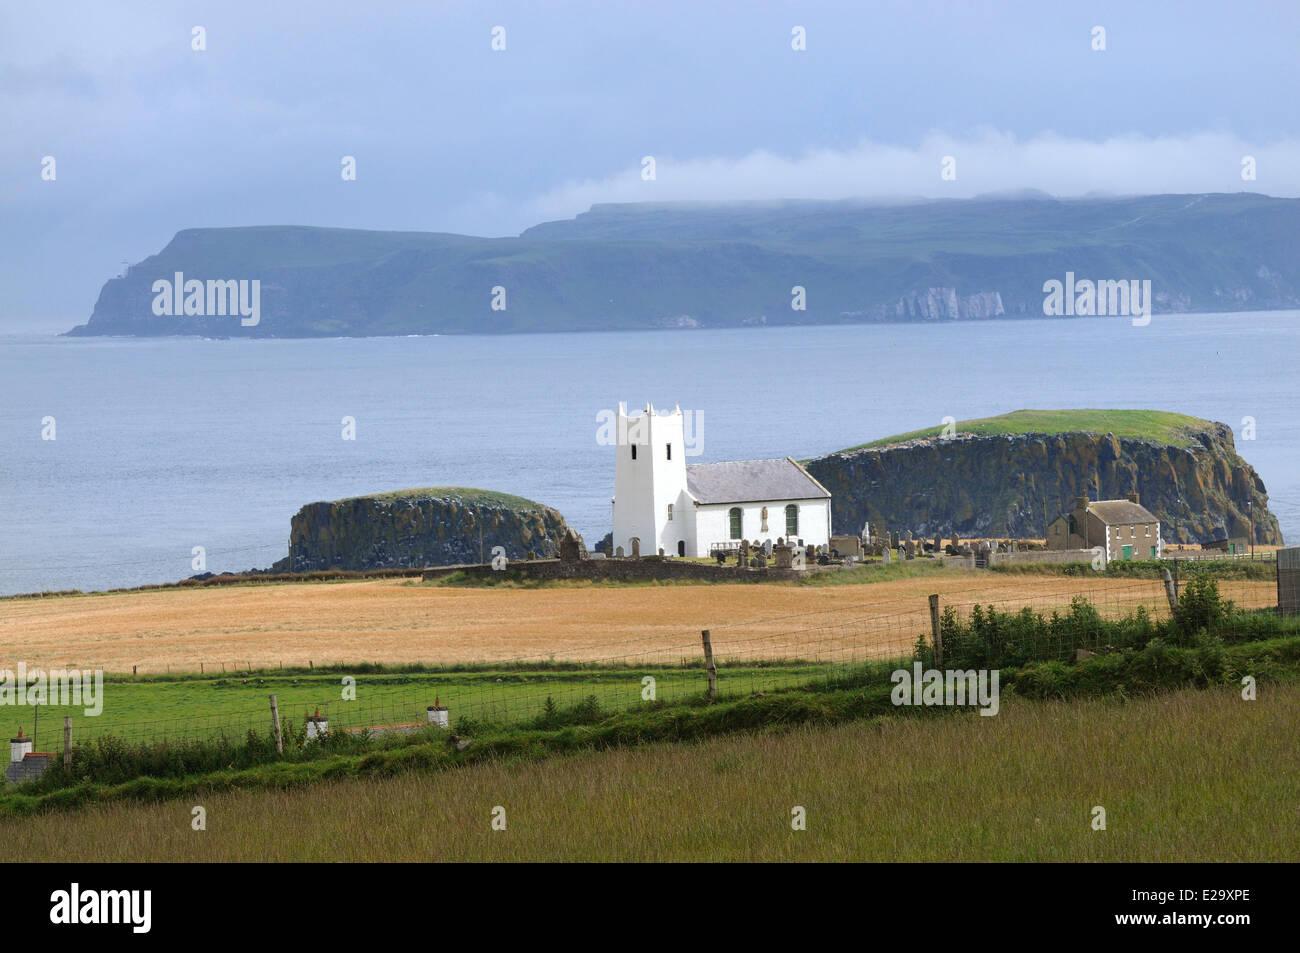 United Kingdom, Northern Ireland, County Antrim, Antrim coast, Ballintoy, The church - Stock Image